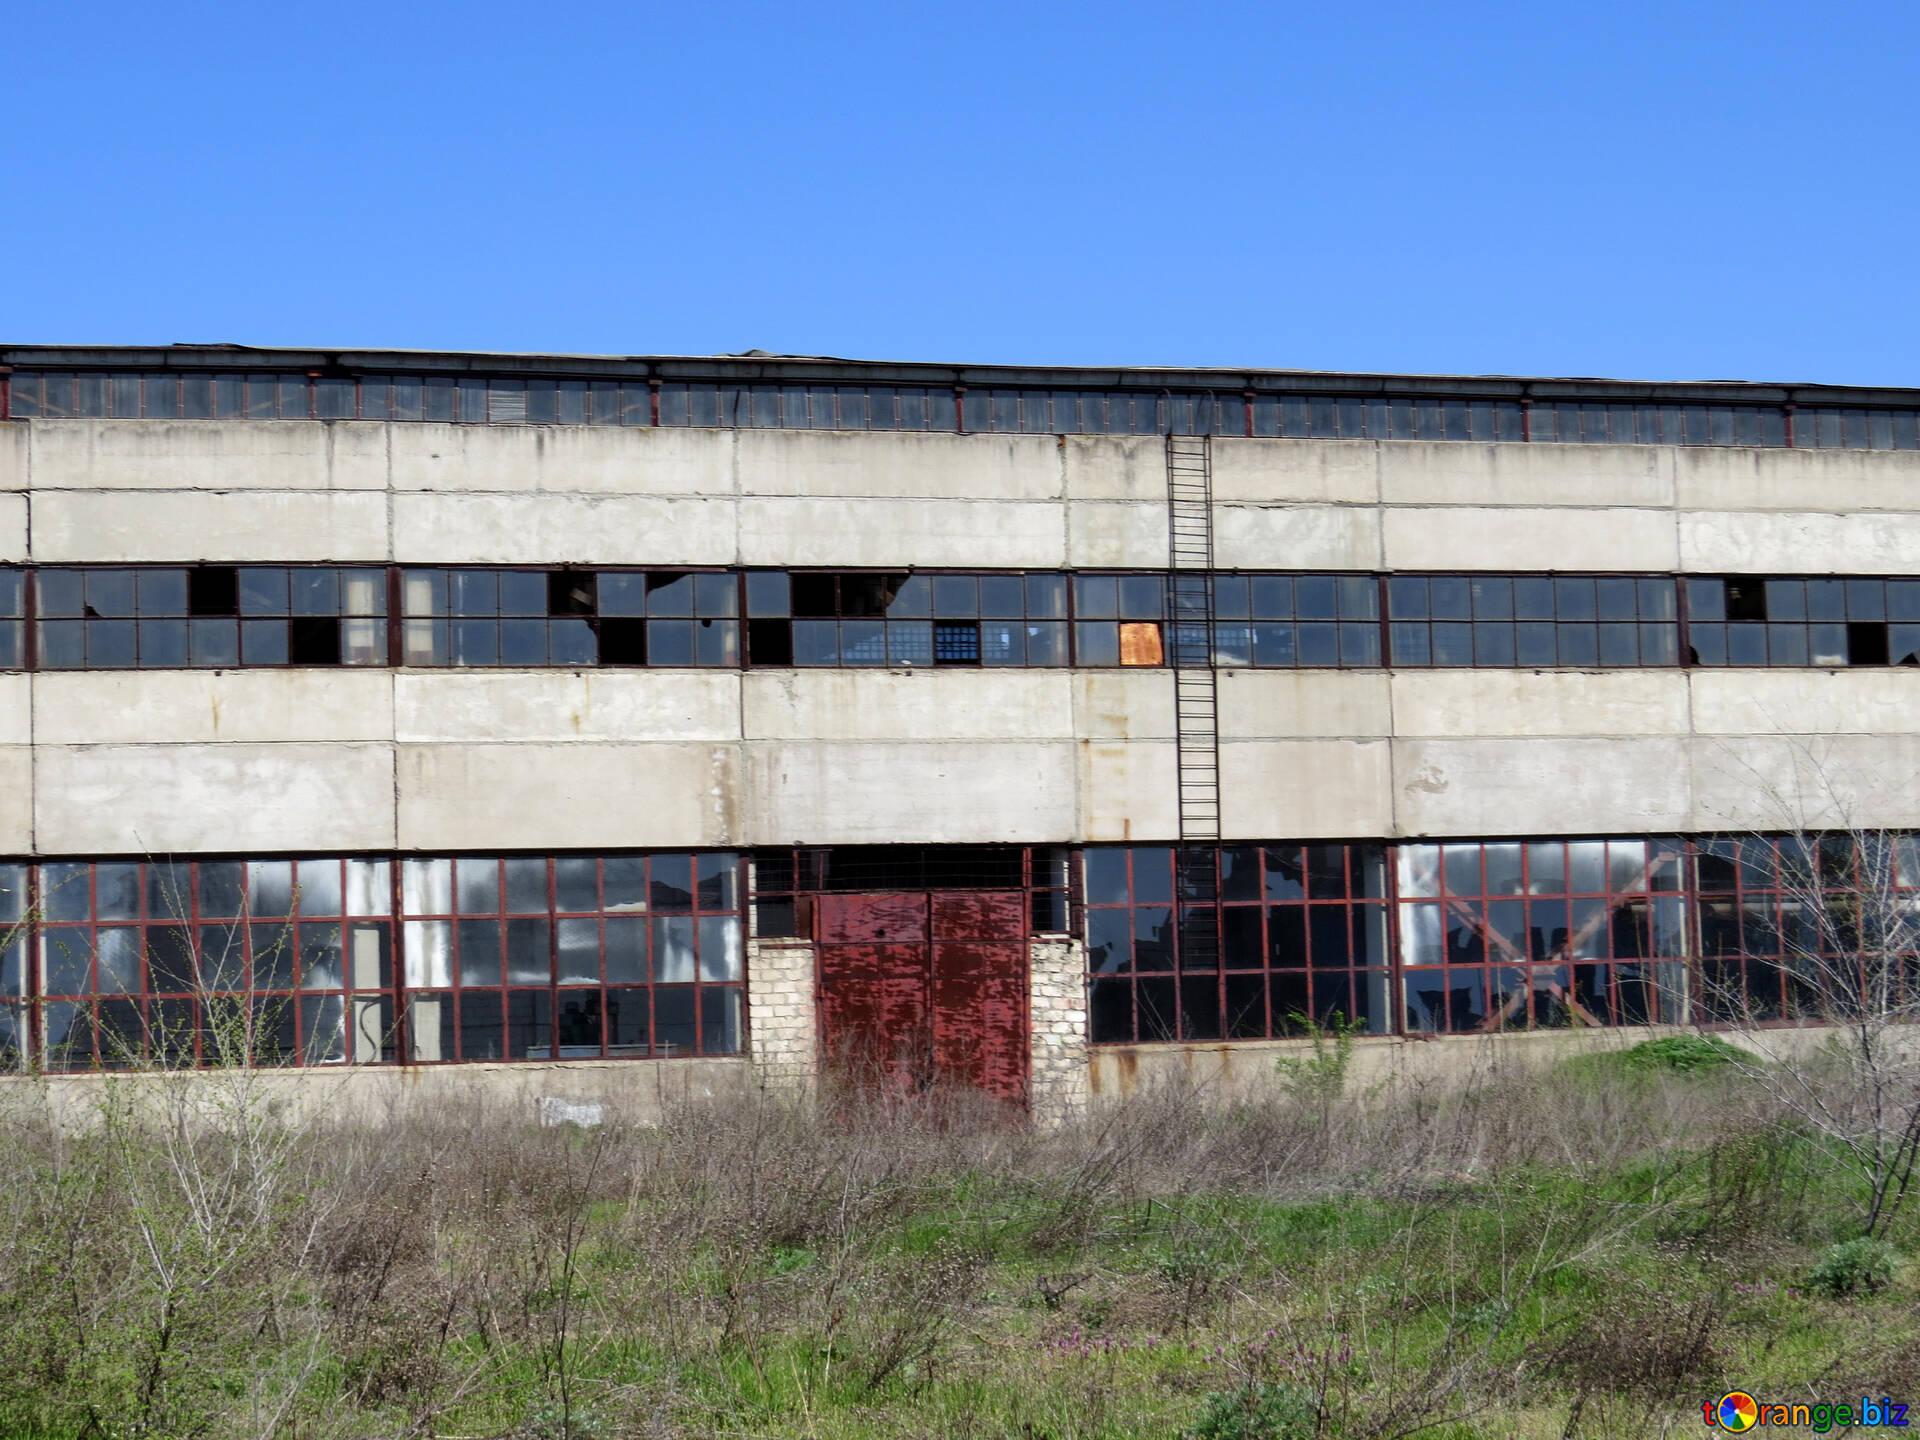 [Image: transnistria-abandoned-factory-indoor-plant-23559.jpg]